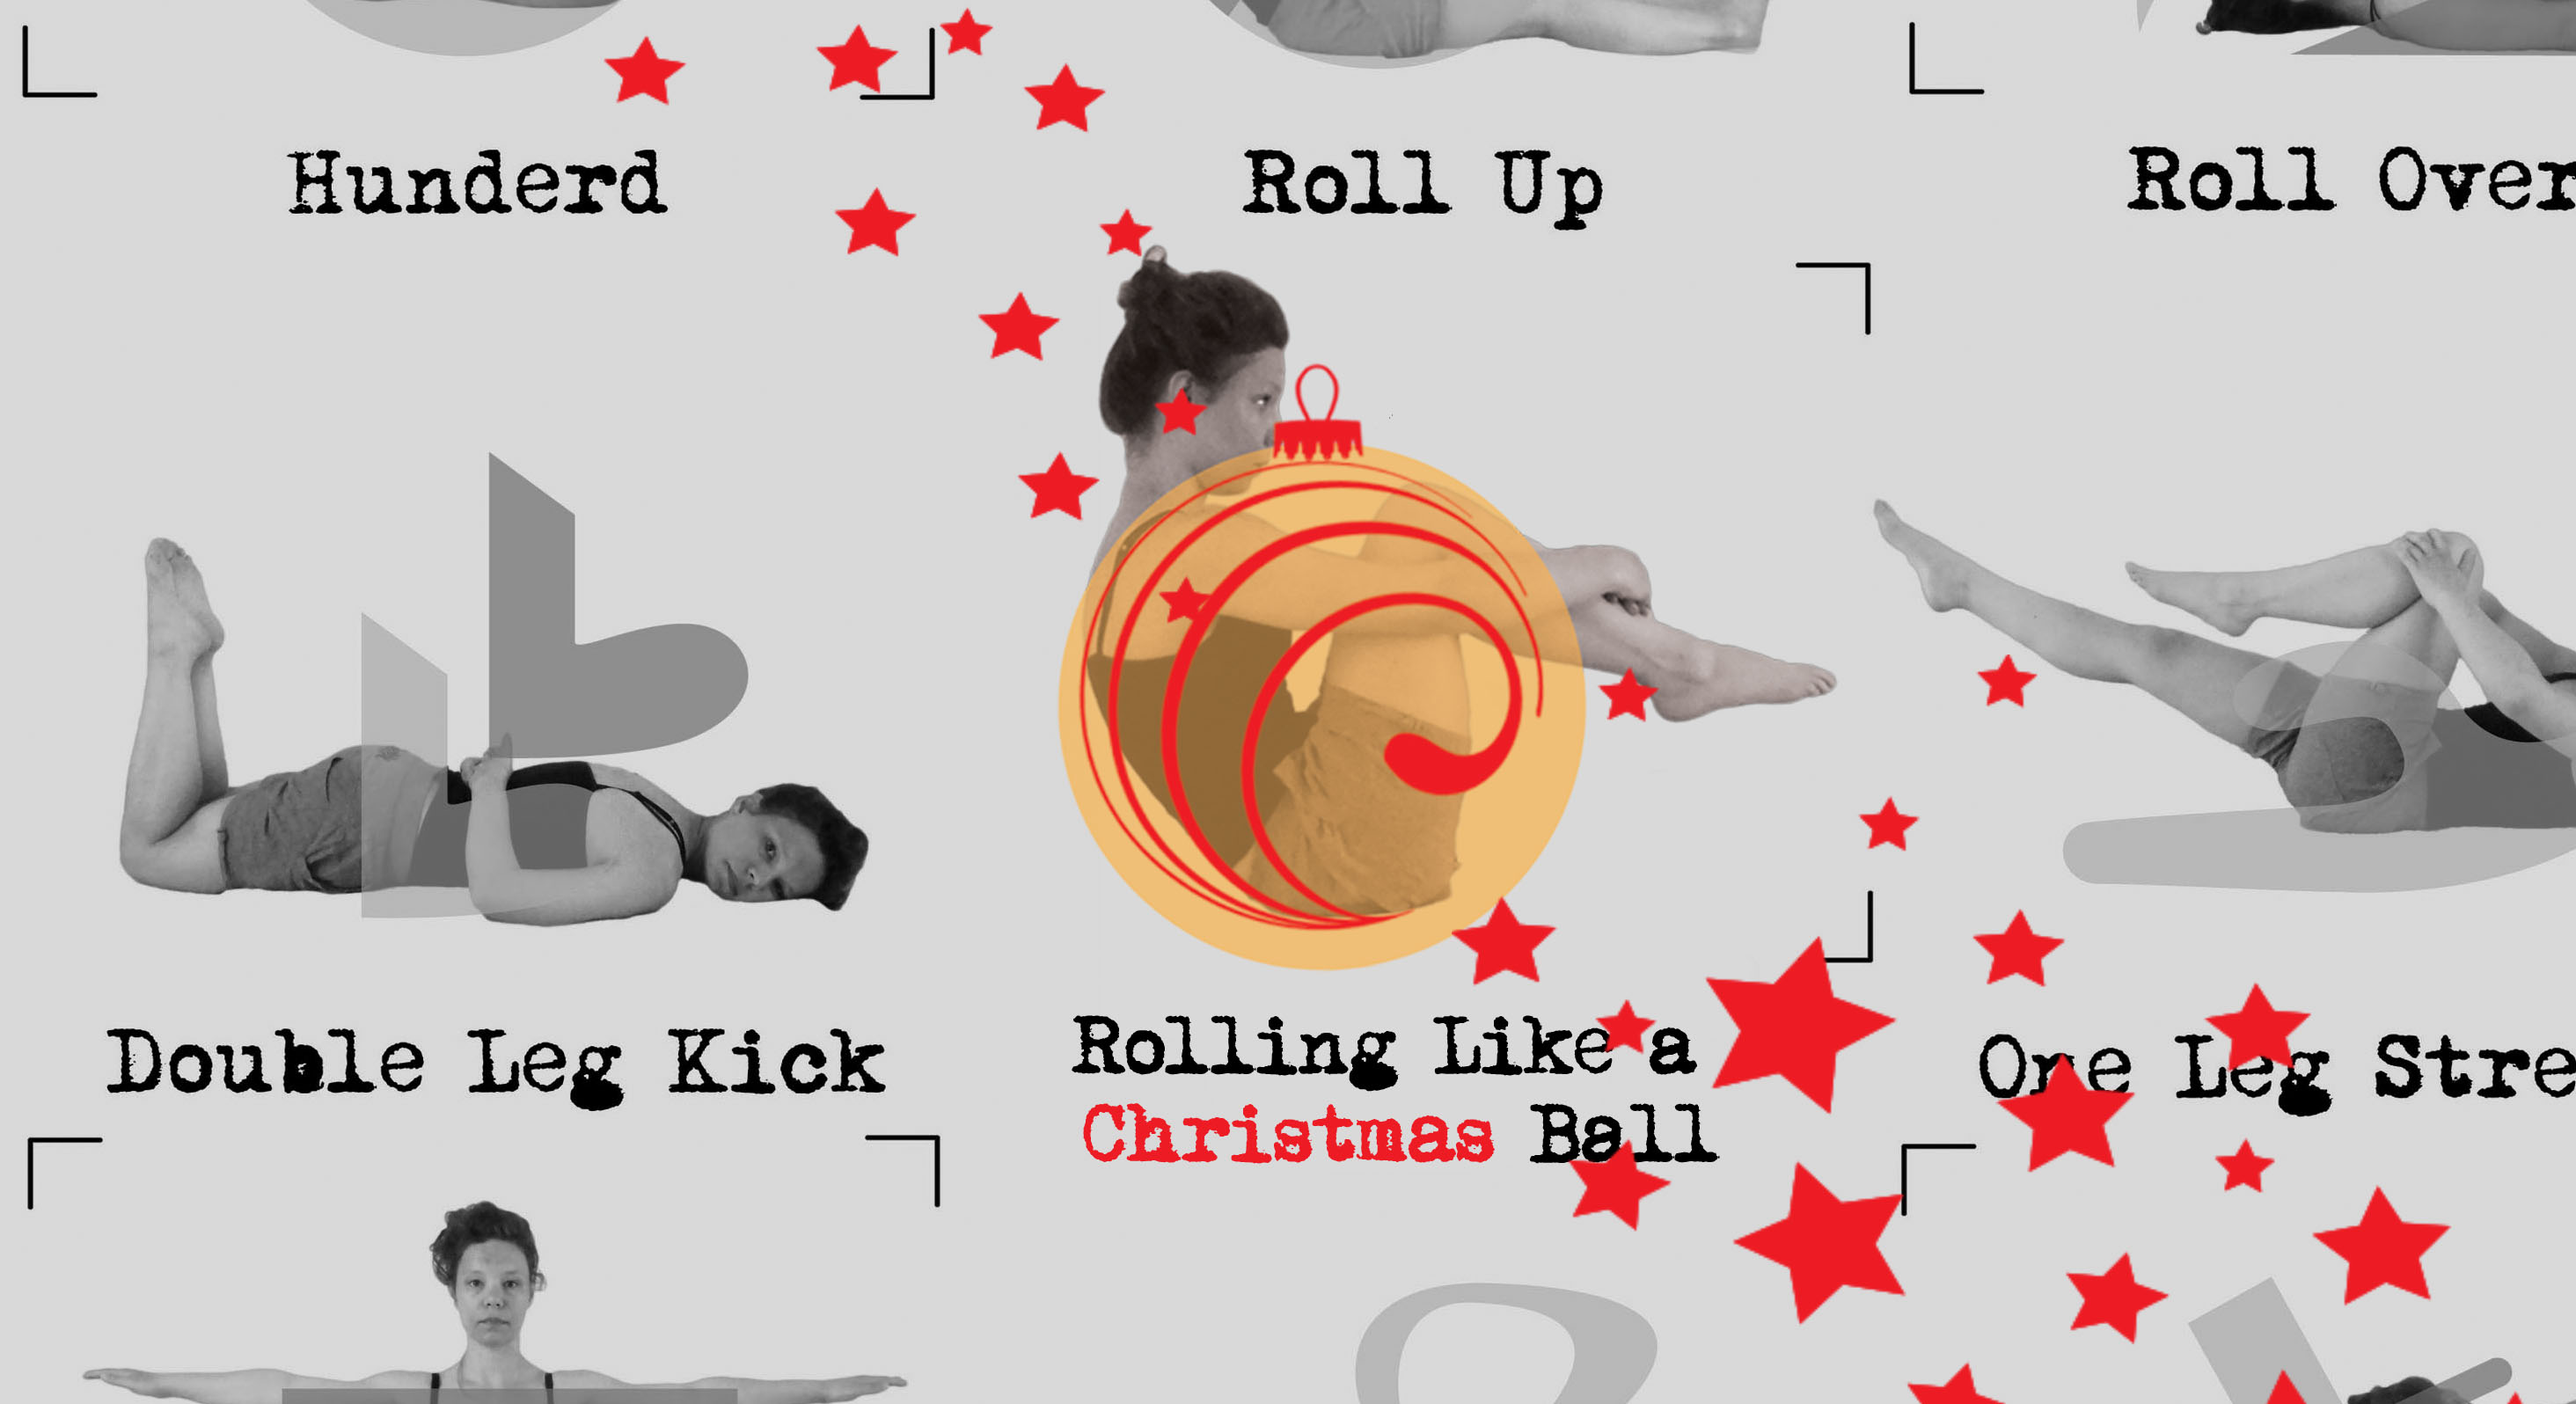 Rolling Like a Xmas Ball